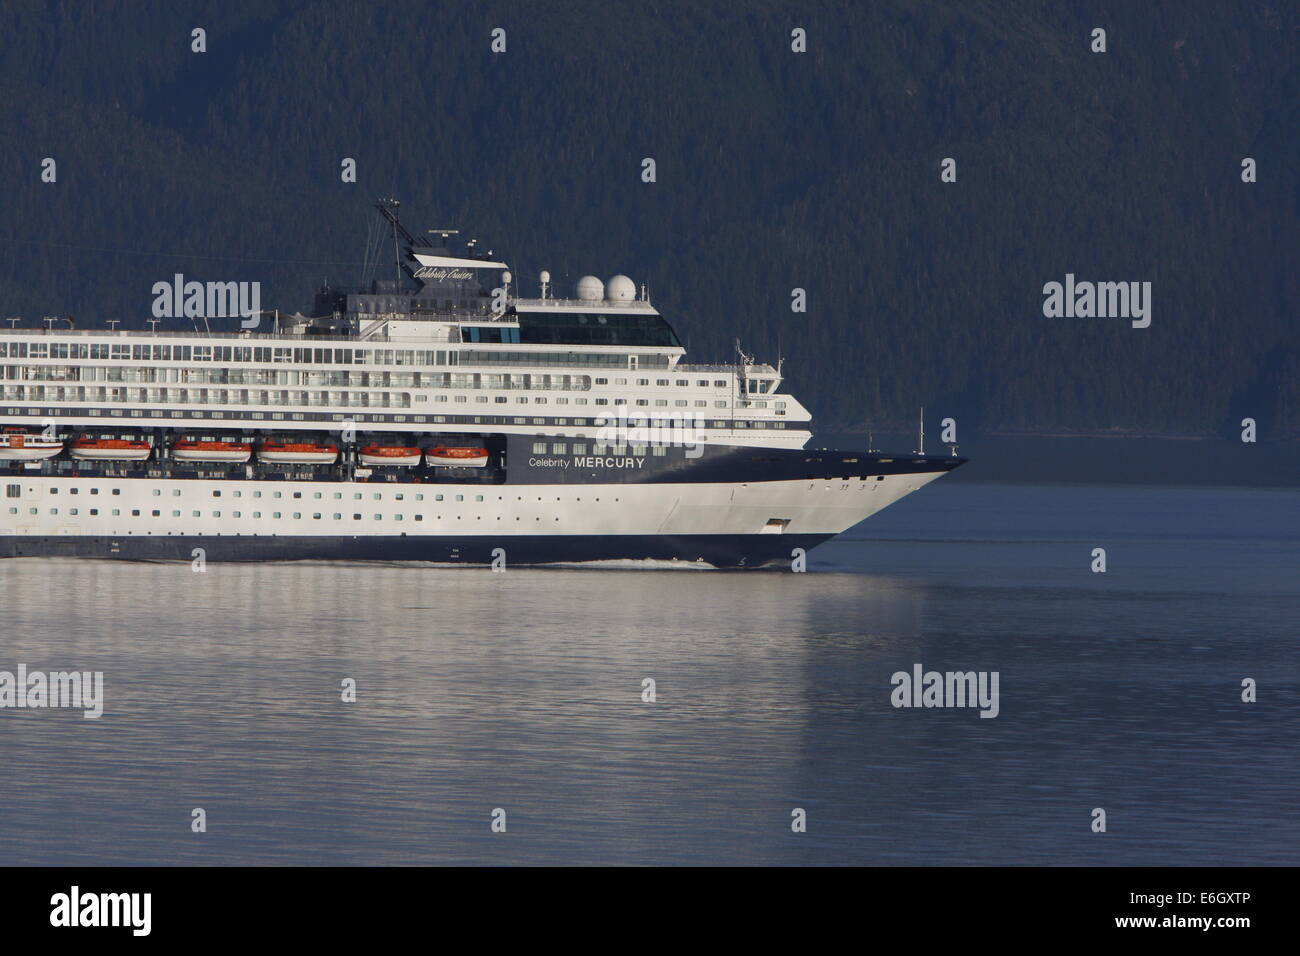 Celebrity cruises open passage